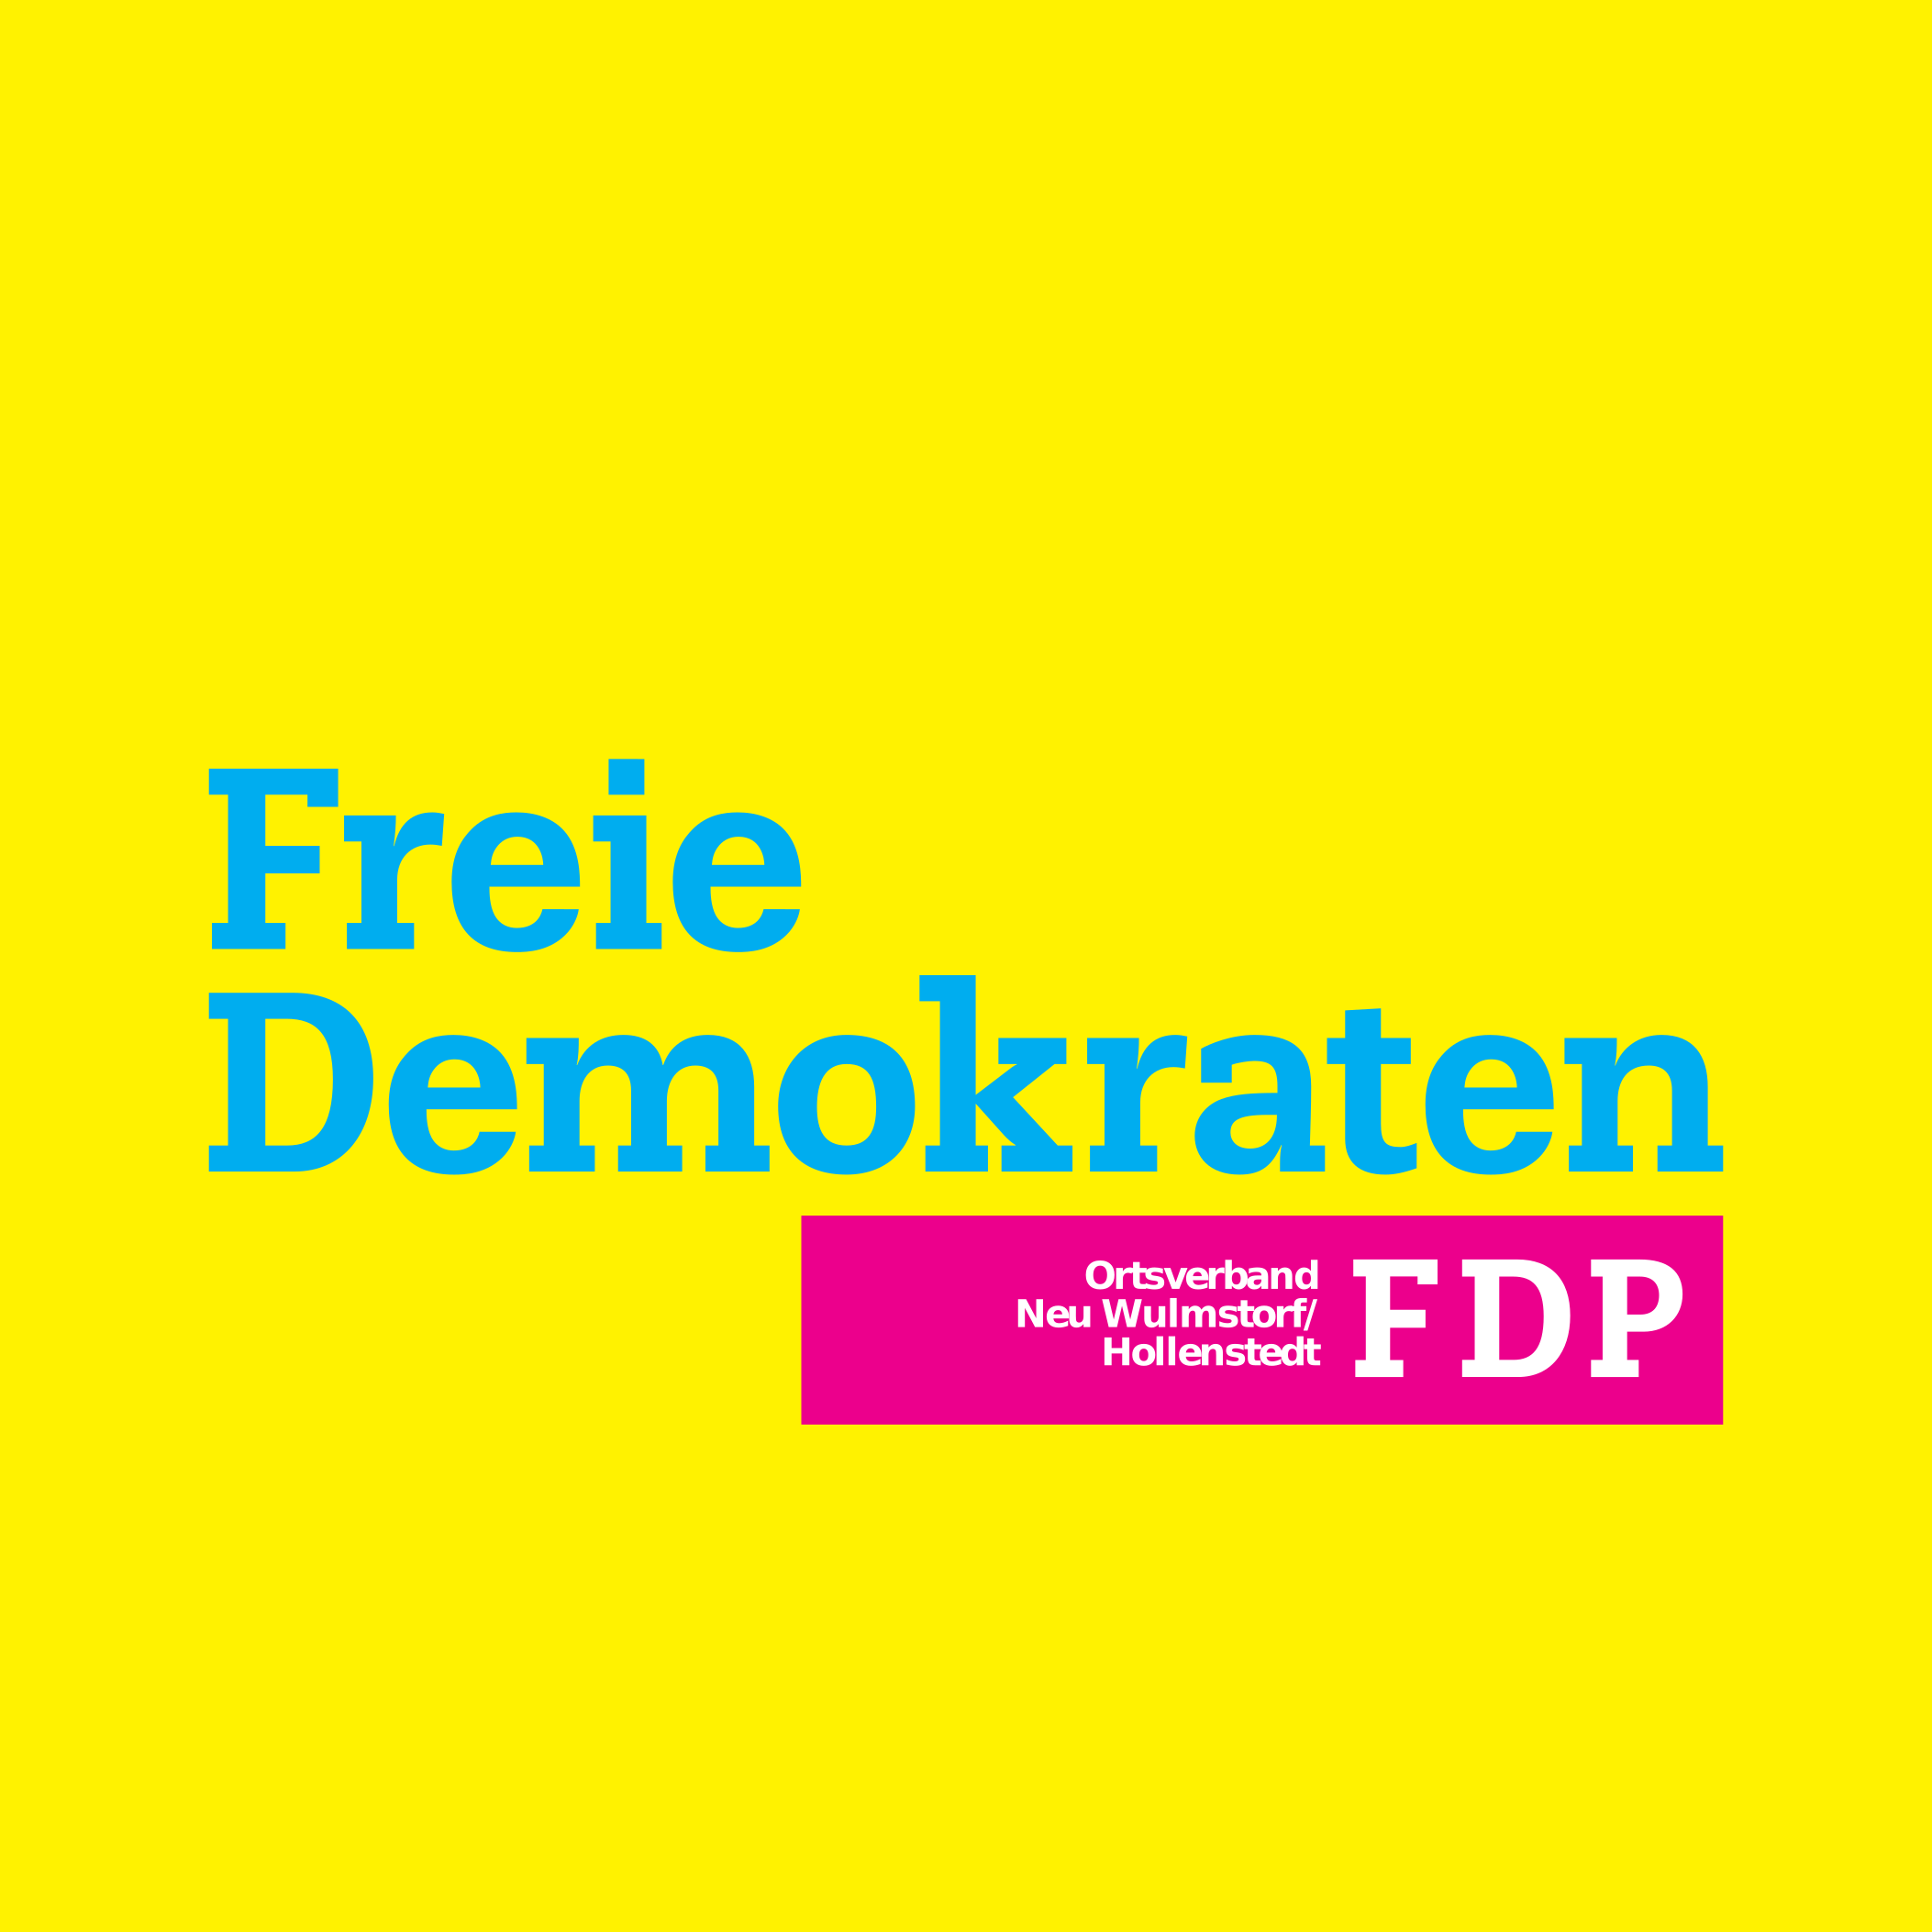 FDP - Freie Demokraten